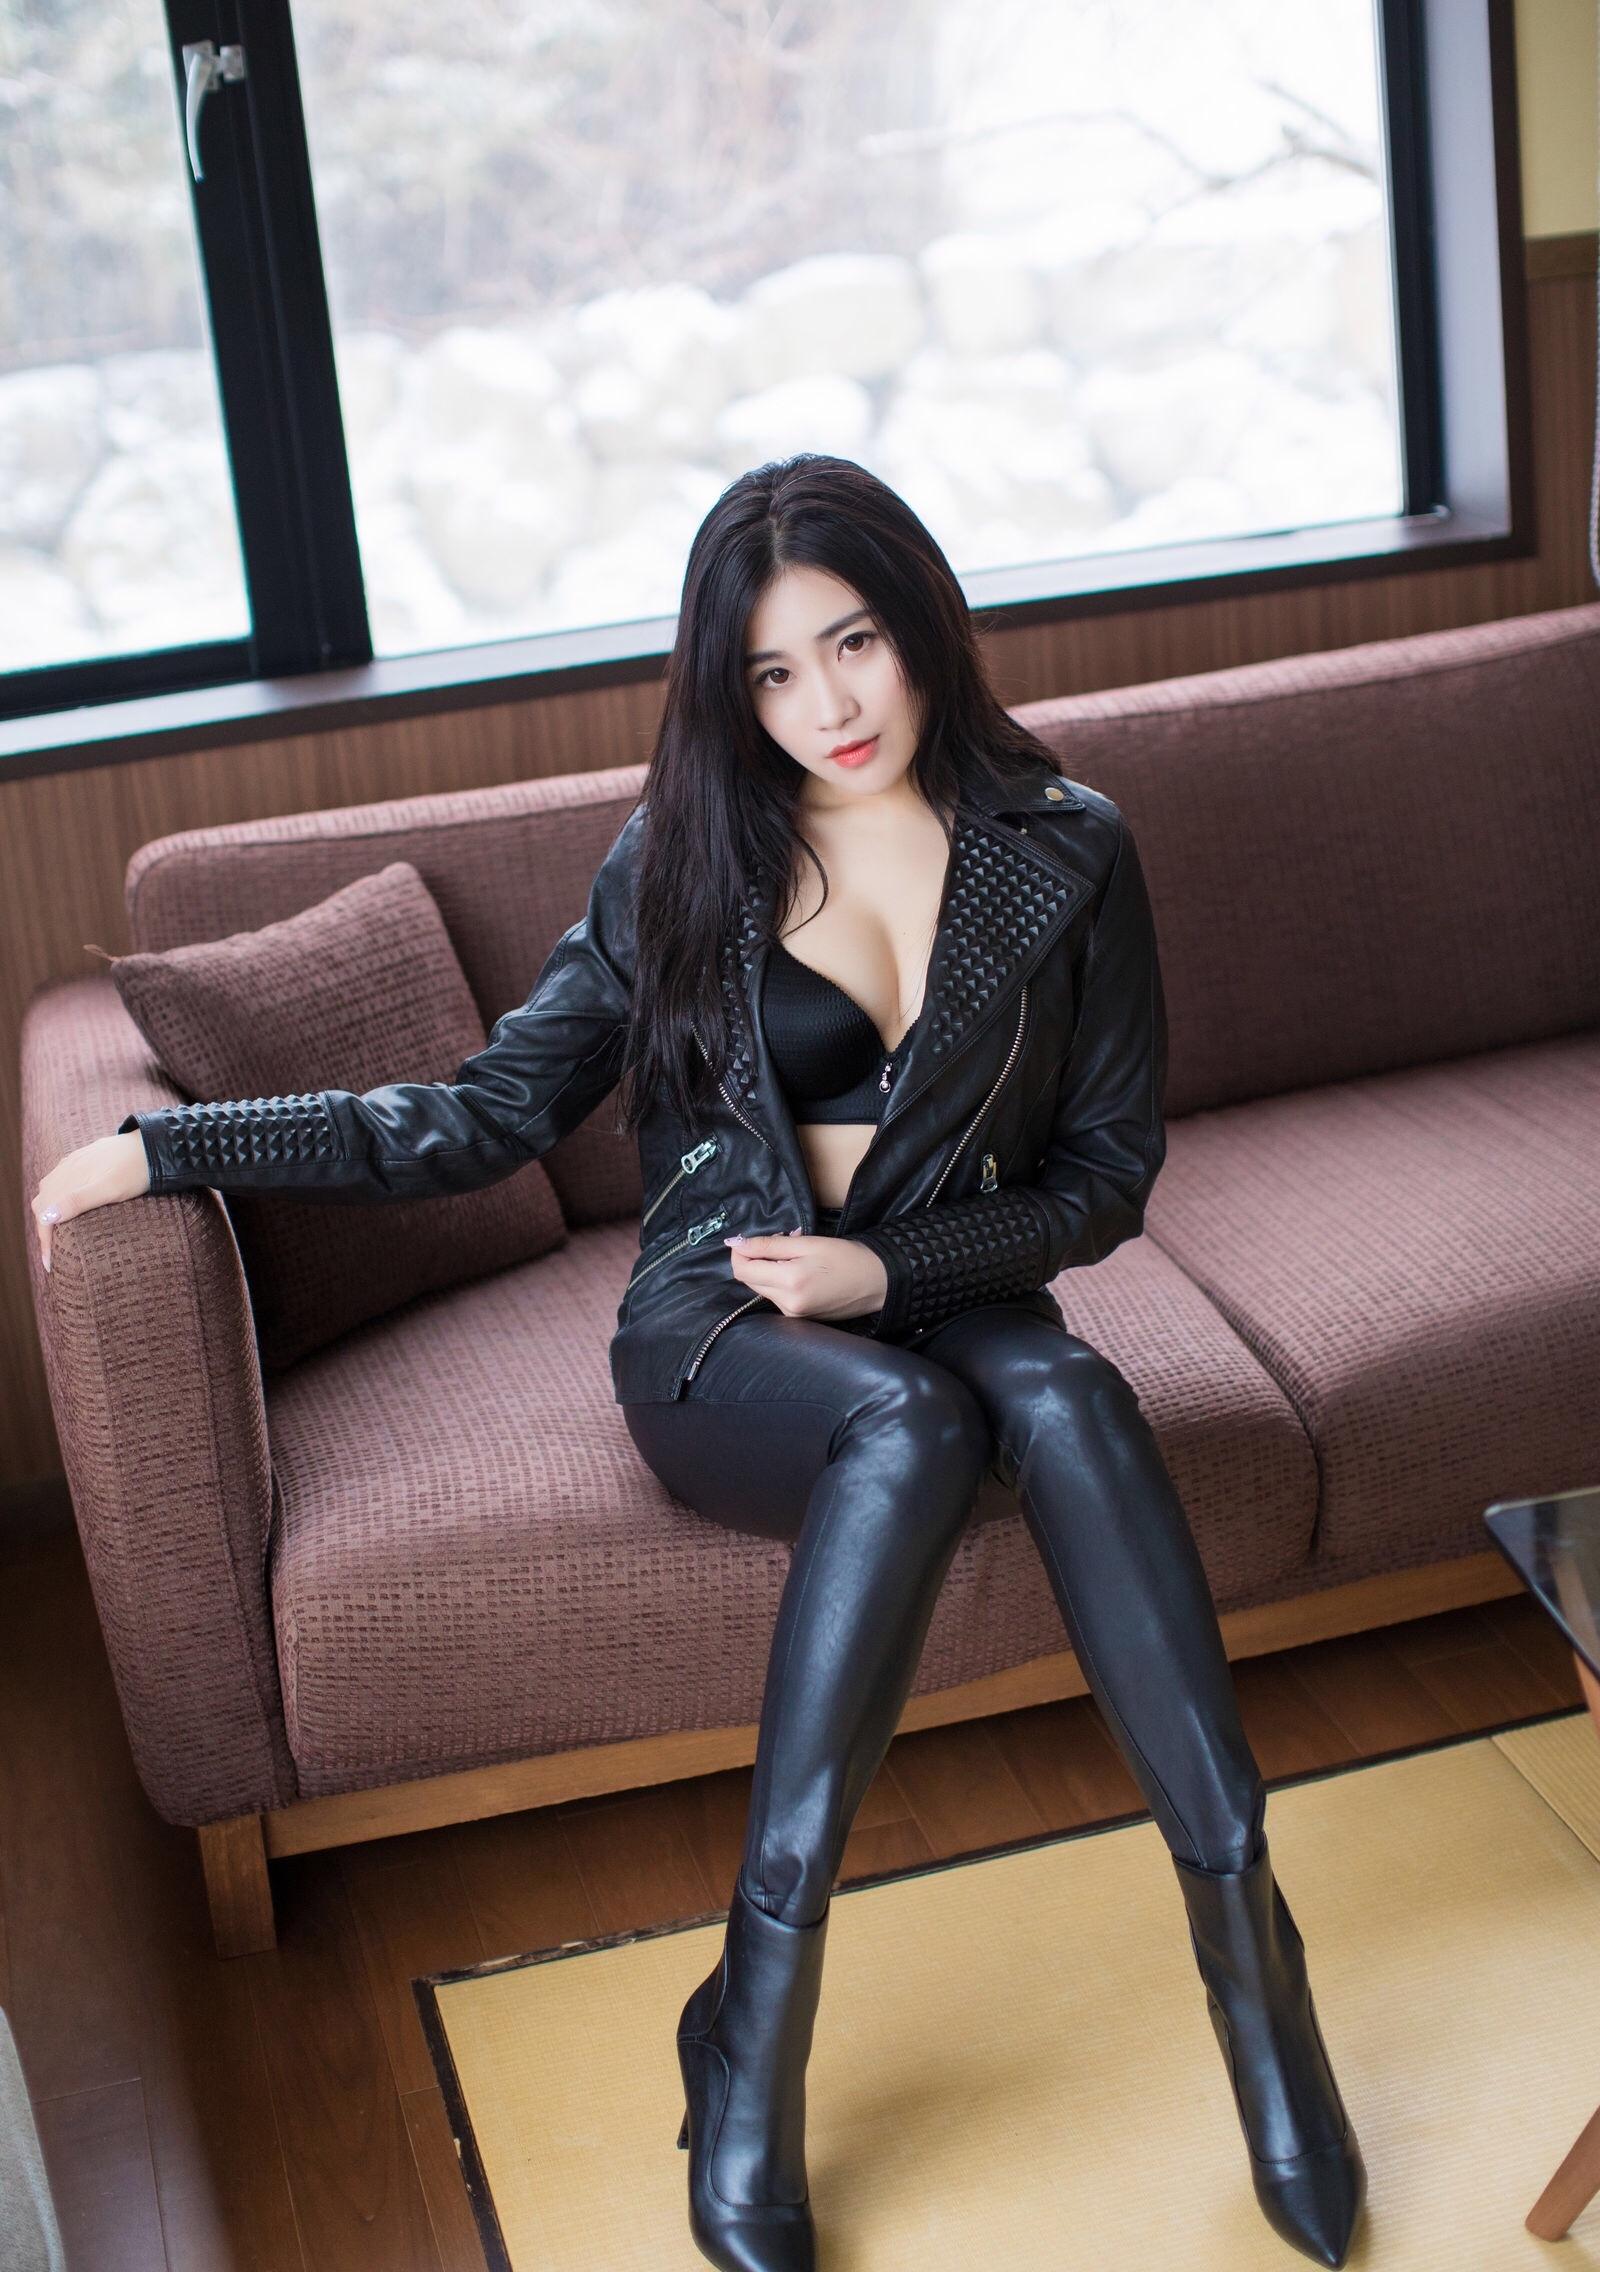 Xu Nuoのセクシーなレザーパンツ足 3